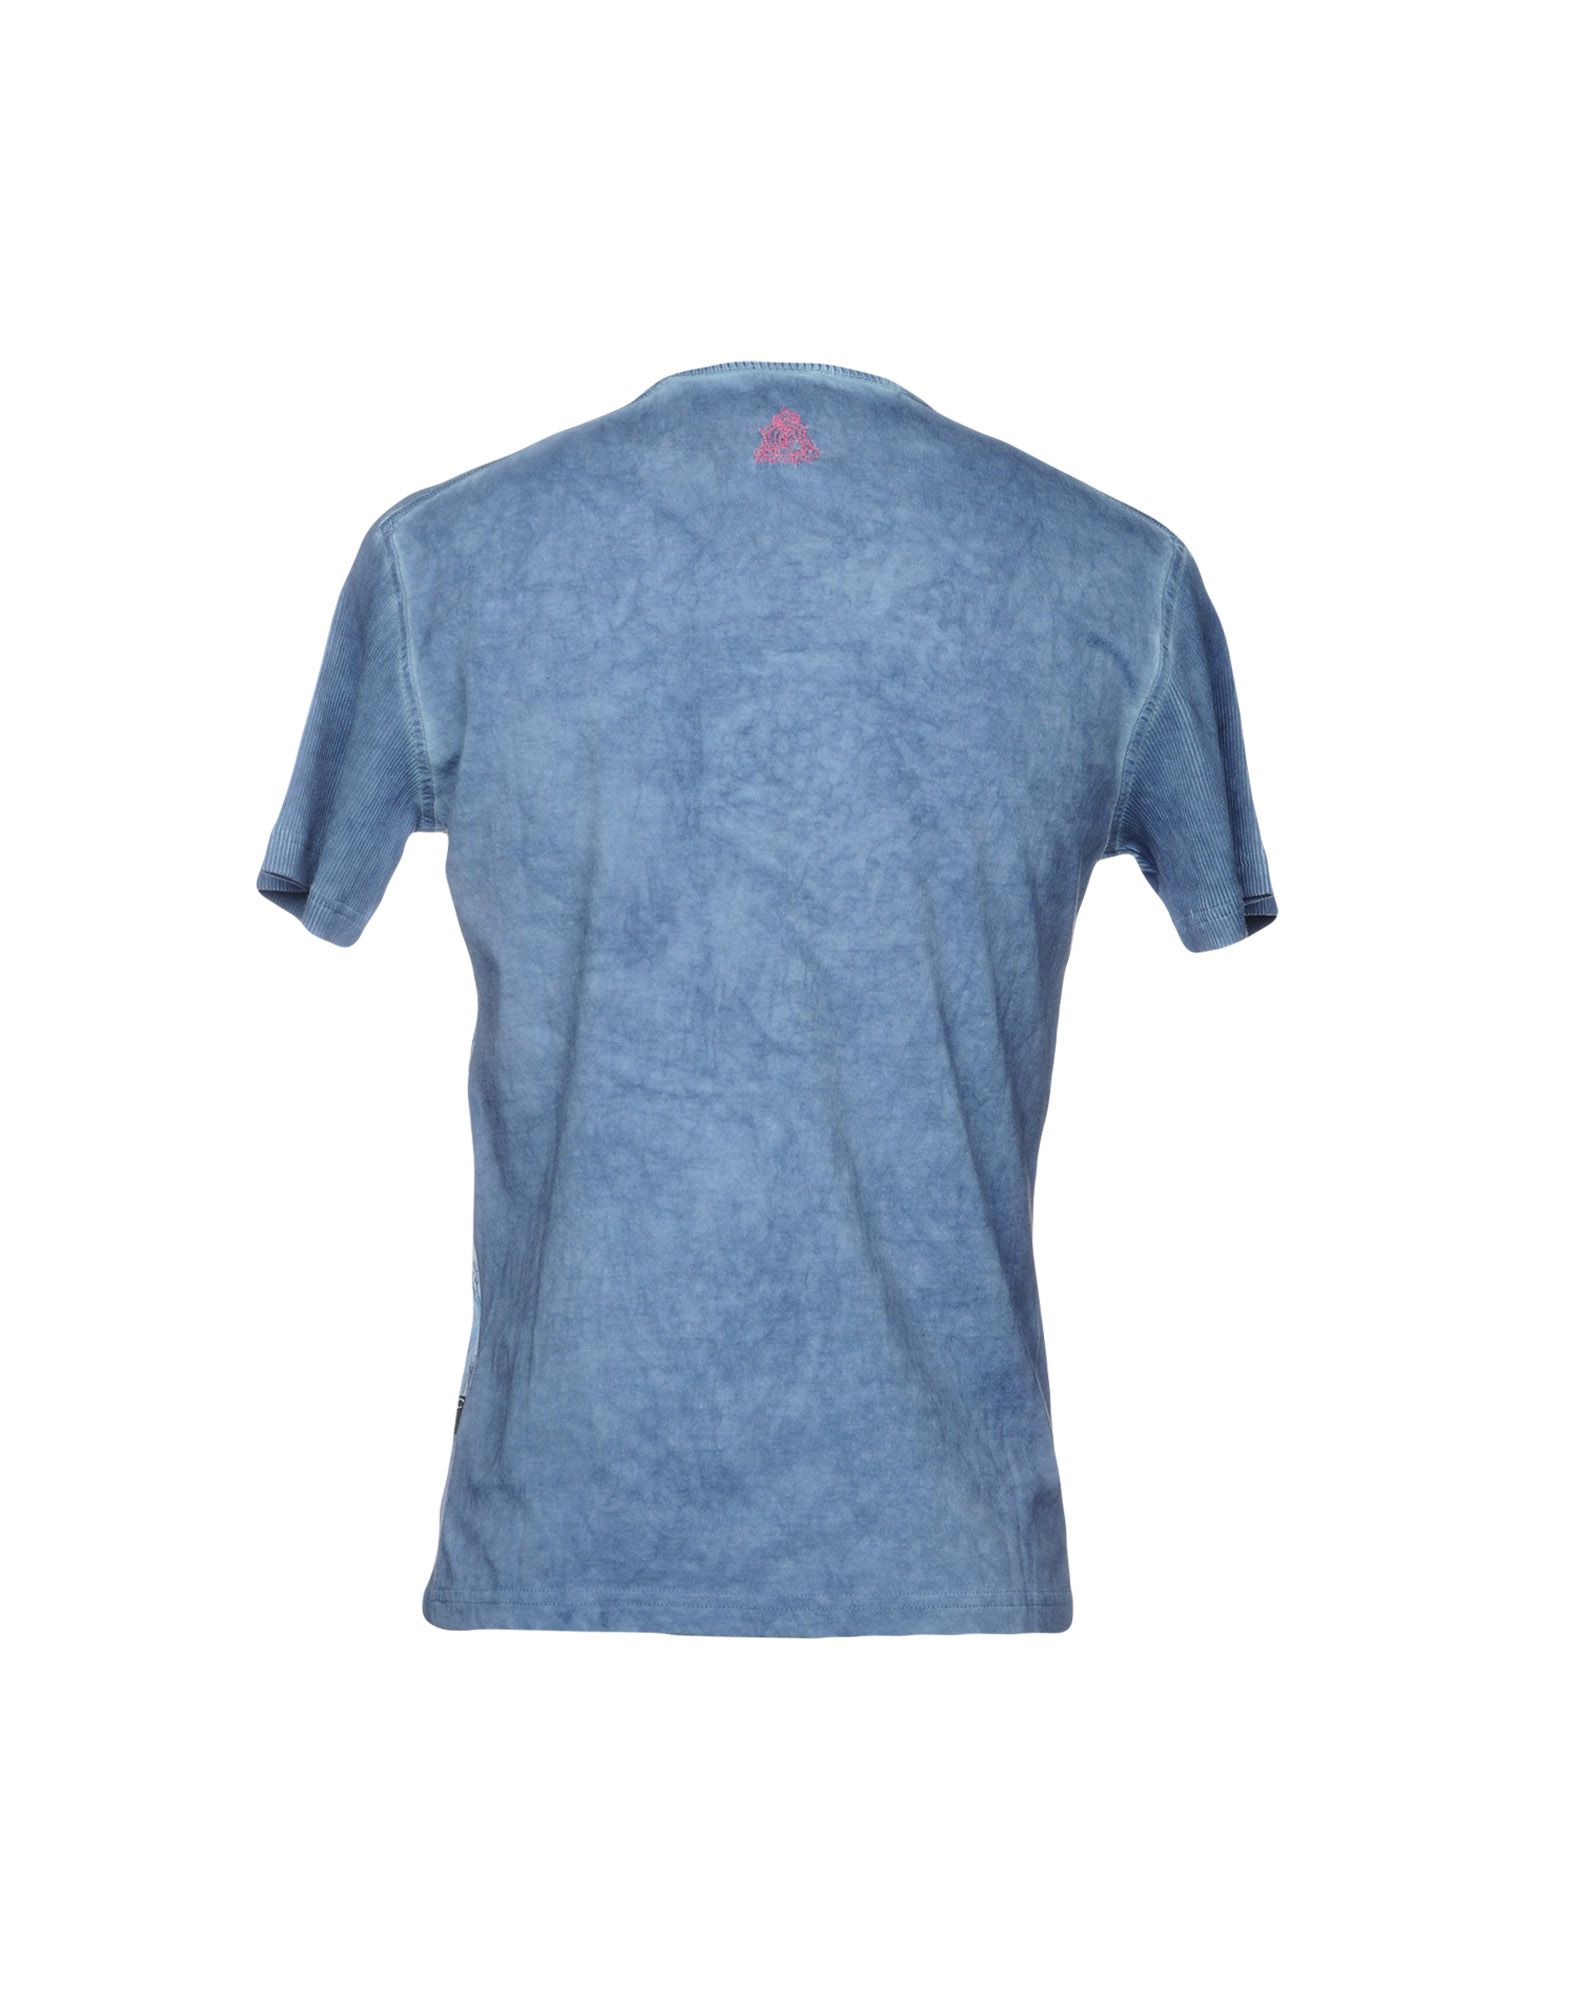 T-Shirt Just Just T-Shirt Cavalli Uomo - 12115138XQ a946c0